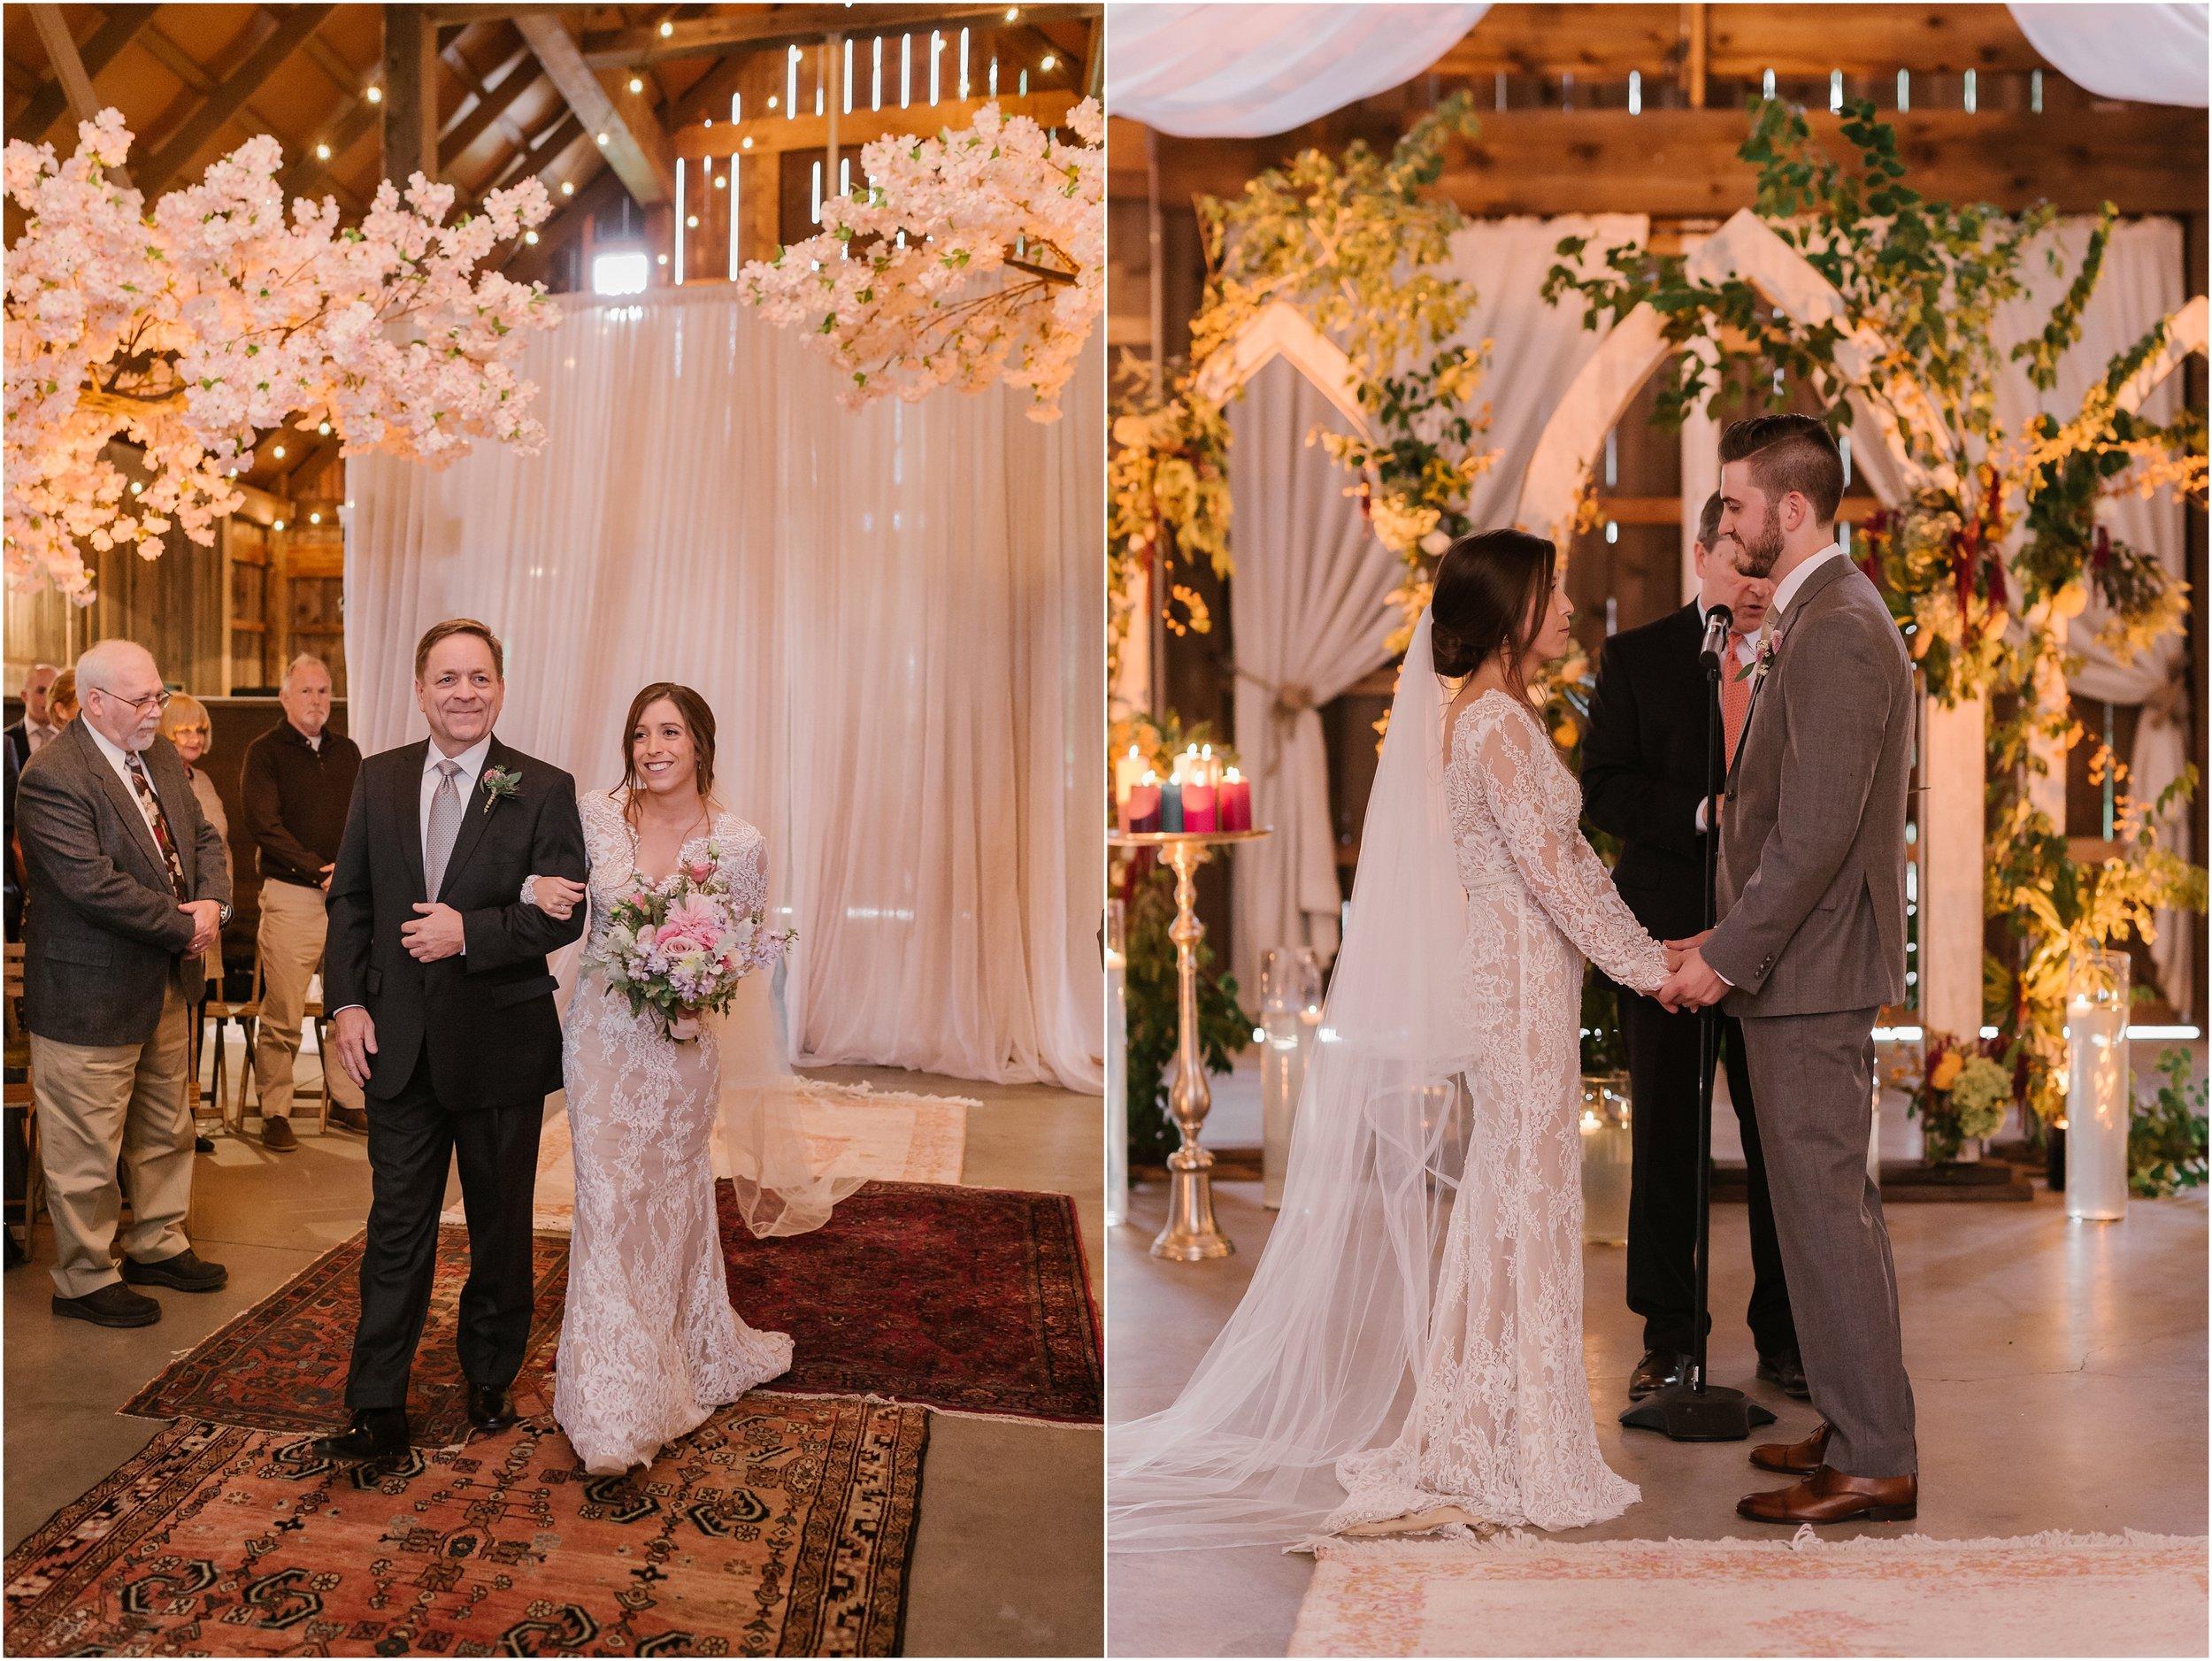 Rebecca_Shehorn_Photography_Indianapolis_Wedding_Photographer_9269.jpg